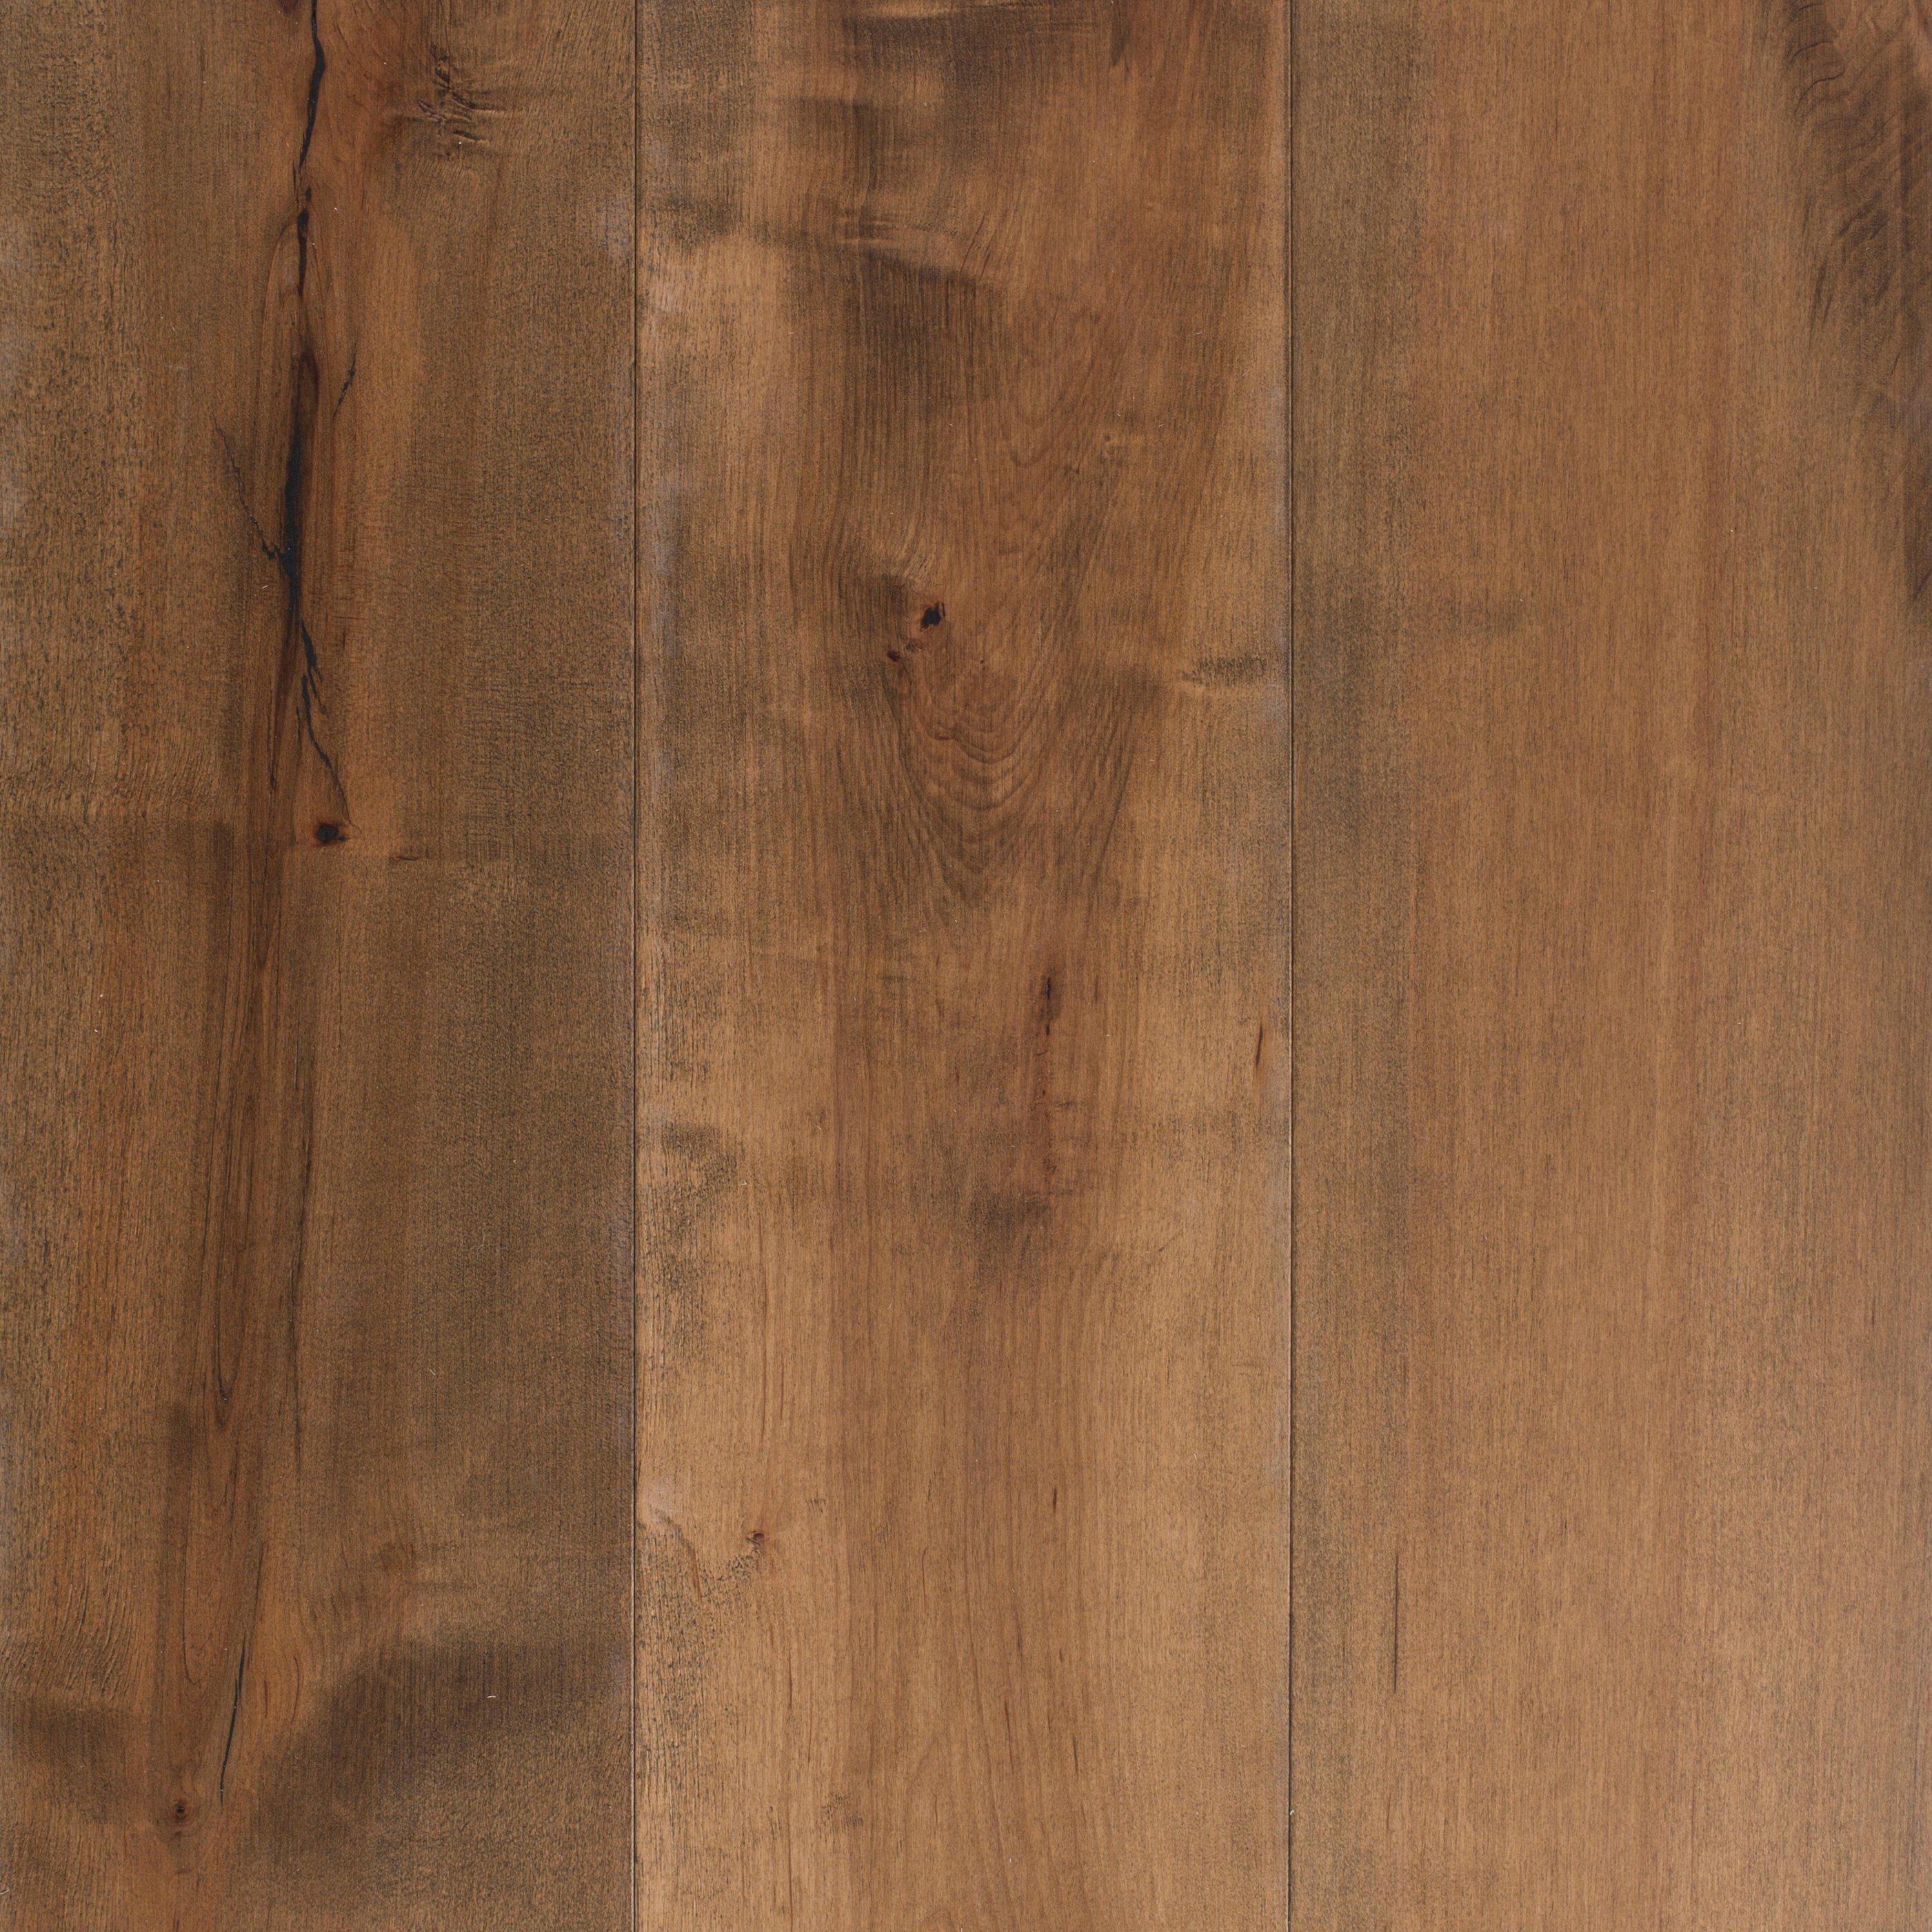 bruce hand scraped hardwood flooring of natural maple hand scraped engineered hardwood pinterest with natural maple hand scraped engineered hardwood